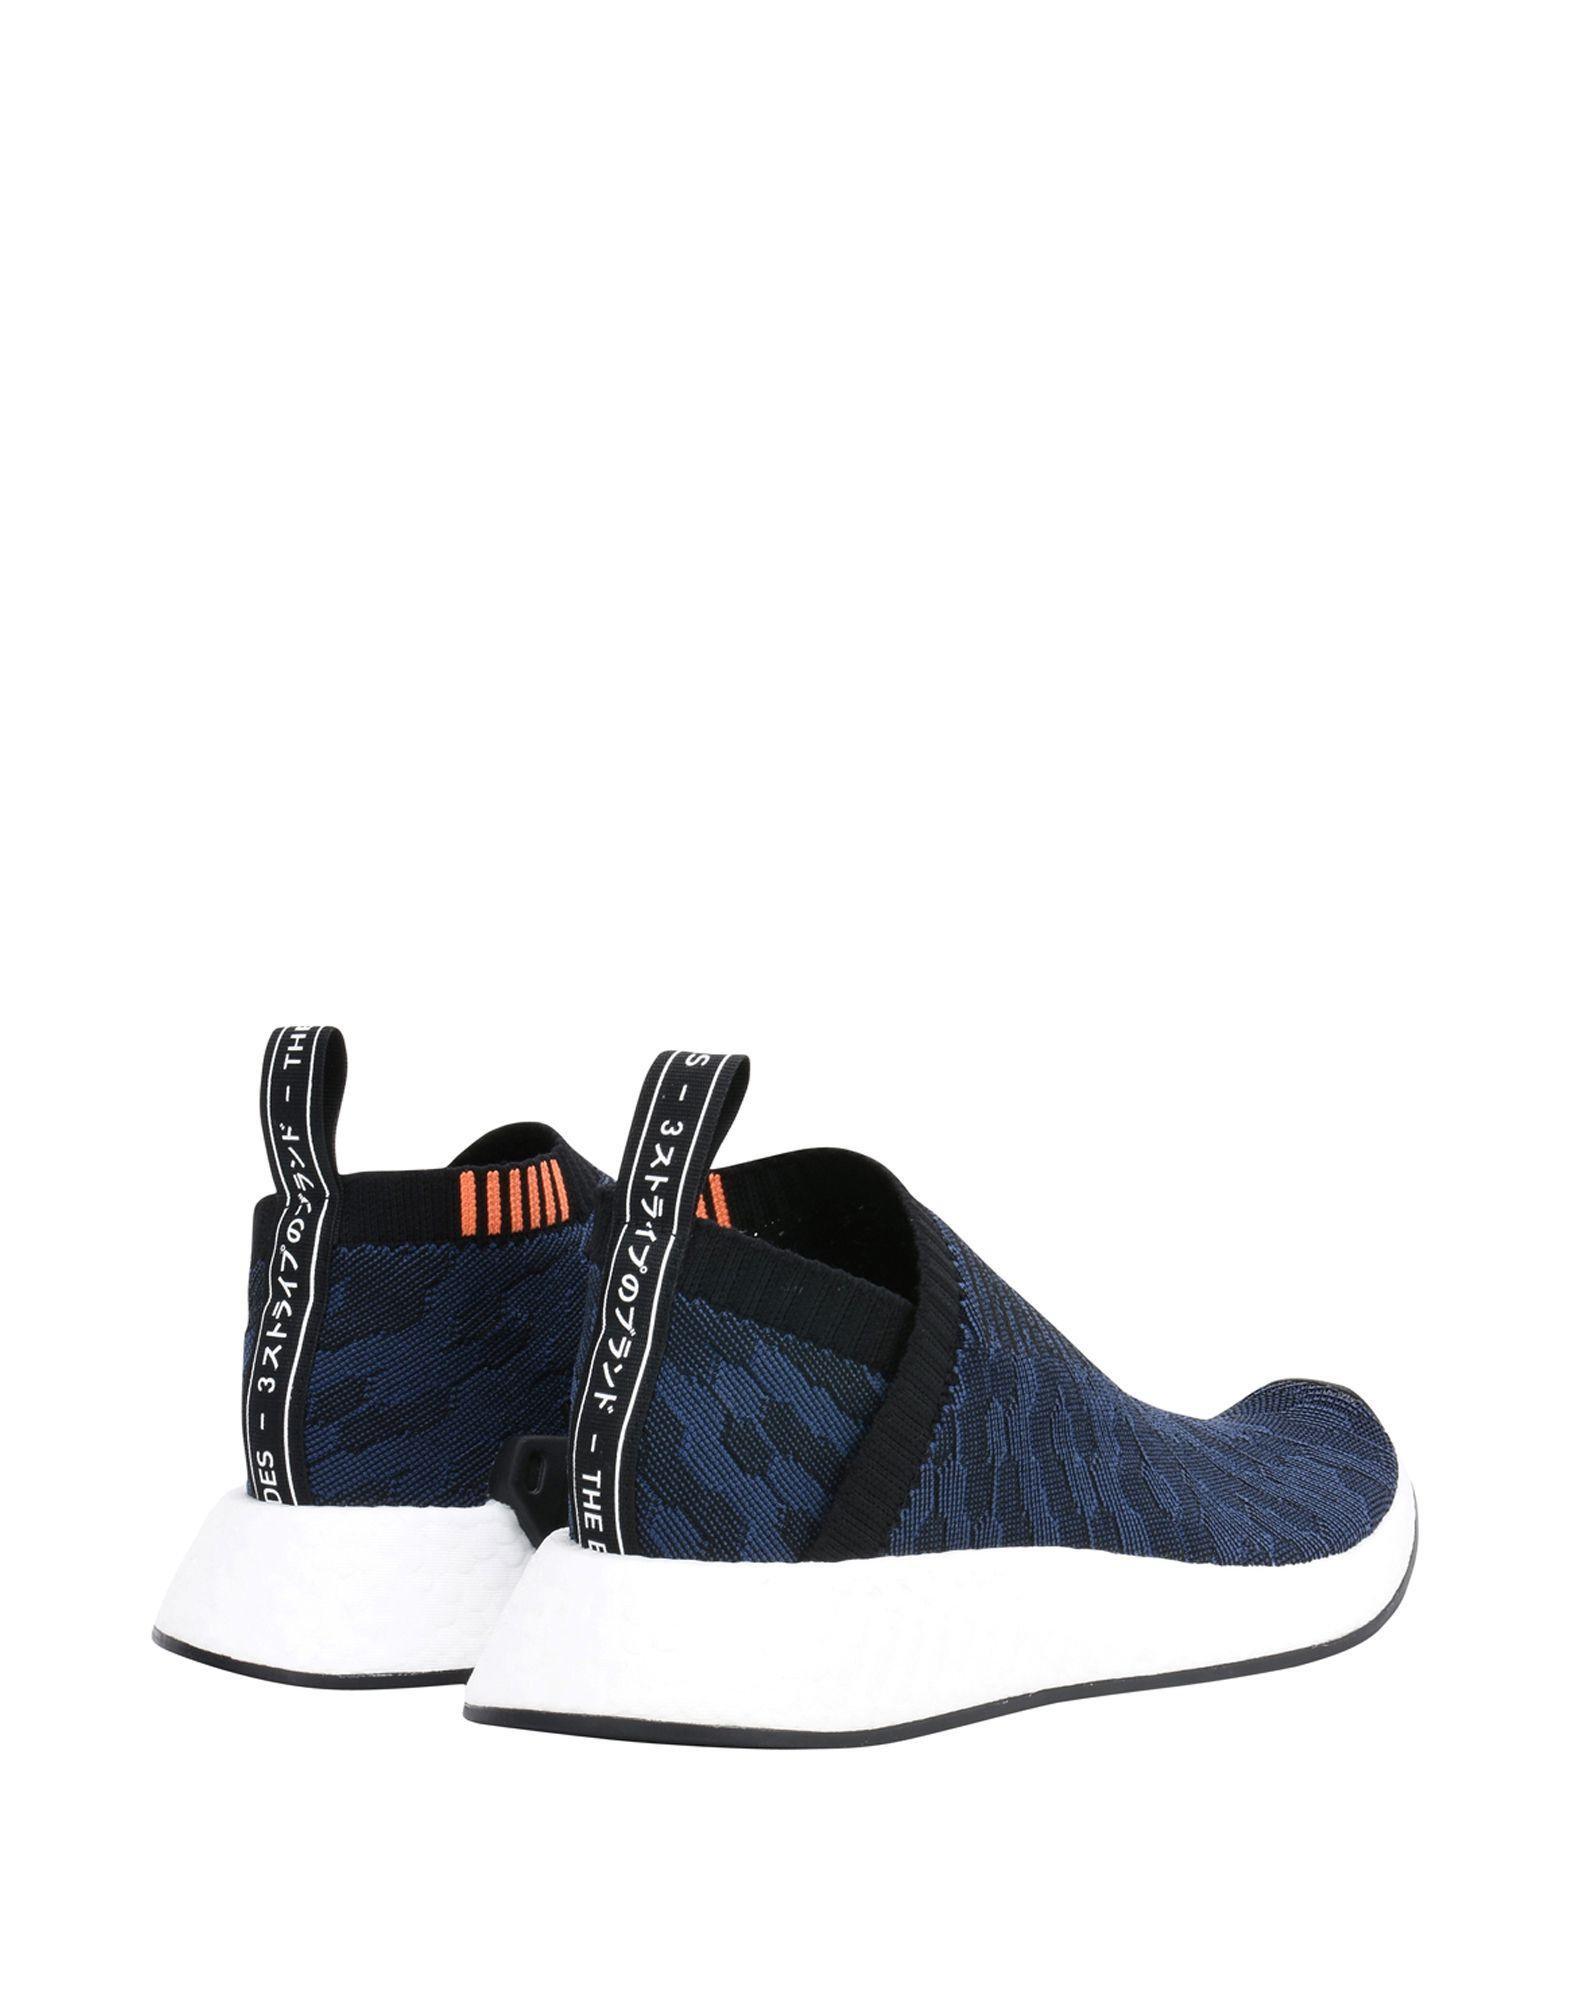 Adidas Originals Nmd_Cs2 aussehende Pk W  11415614HSGut aussehende Nmd_Cs2 strapazierfähige Schuhe e644a3